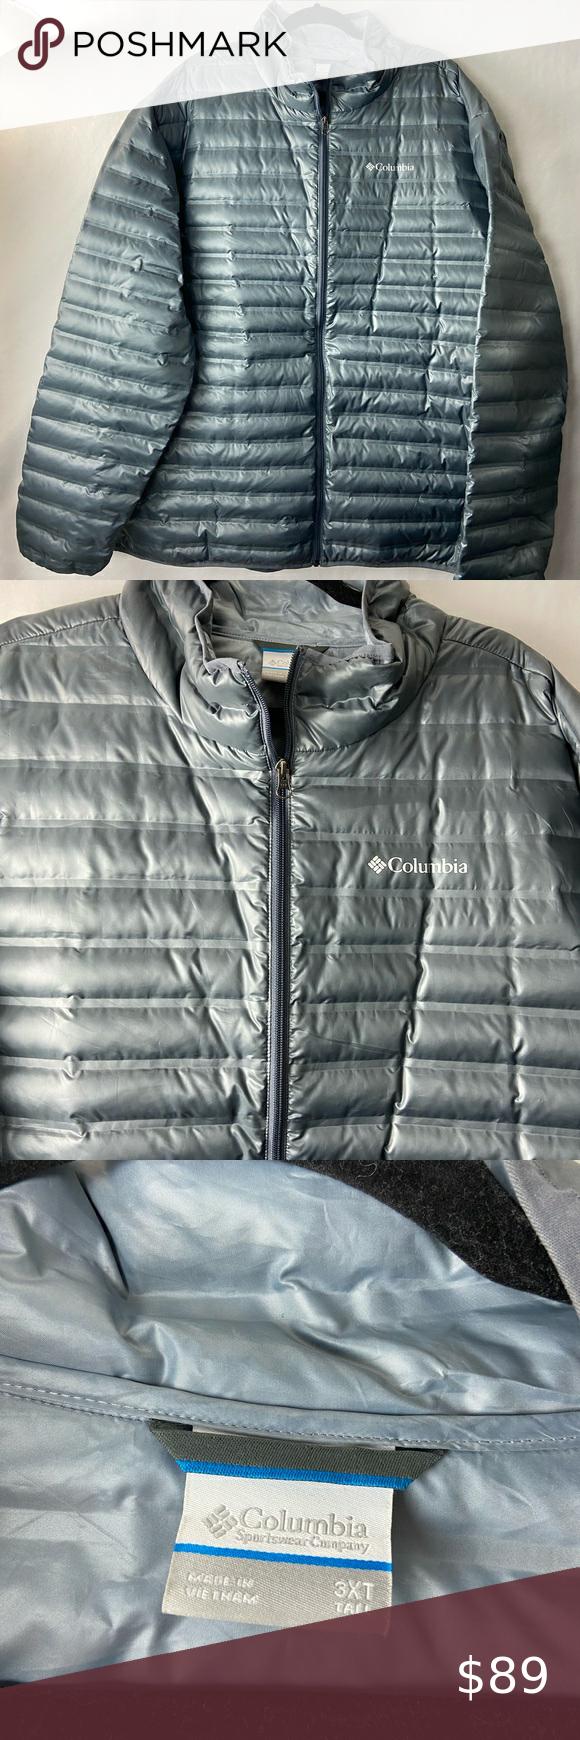 Columbia Down Jacket Flash Forward Gray 3xl Down Jacket Down Puffer Coat Jackets [ 1740 x 580 Pixel ]